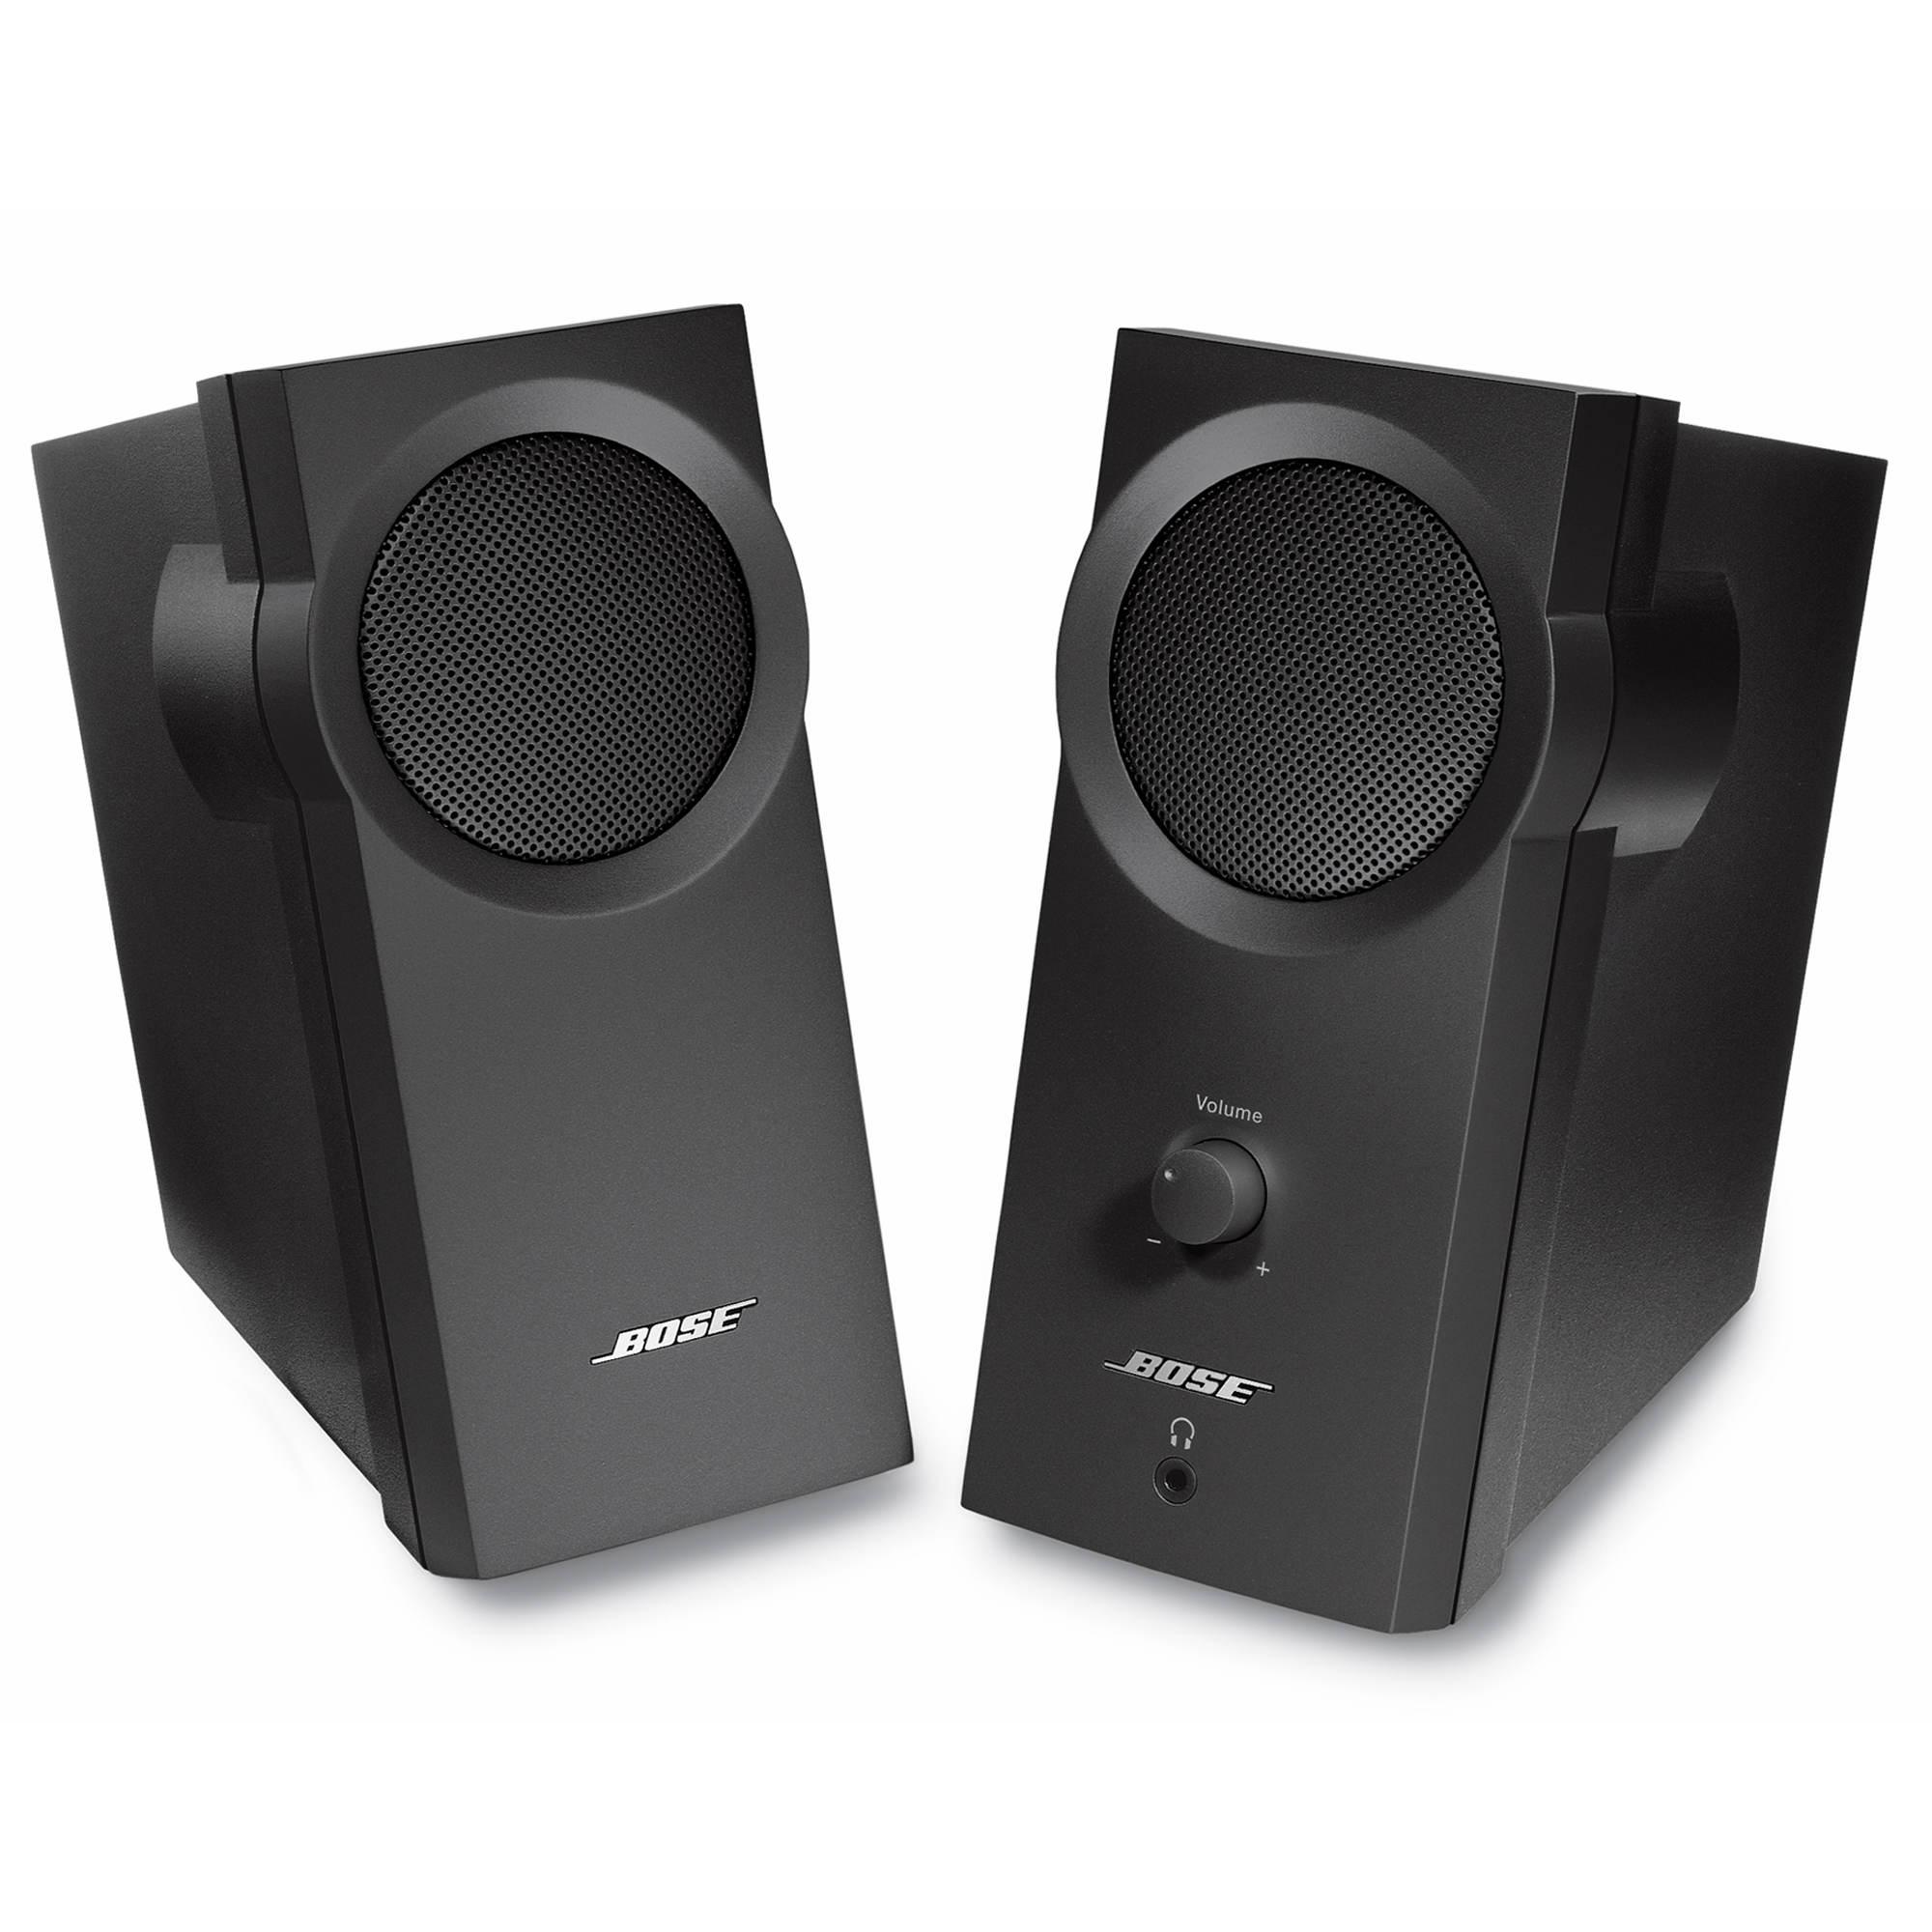 Bose Companion 2 Series I Multimedia Speaker System